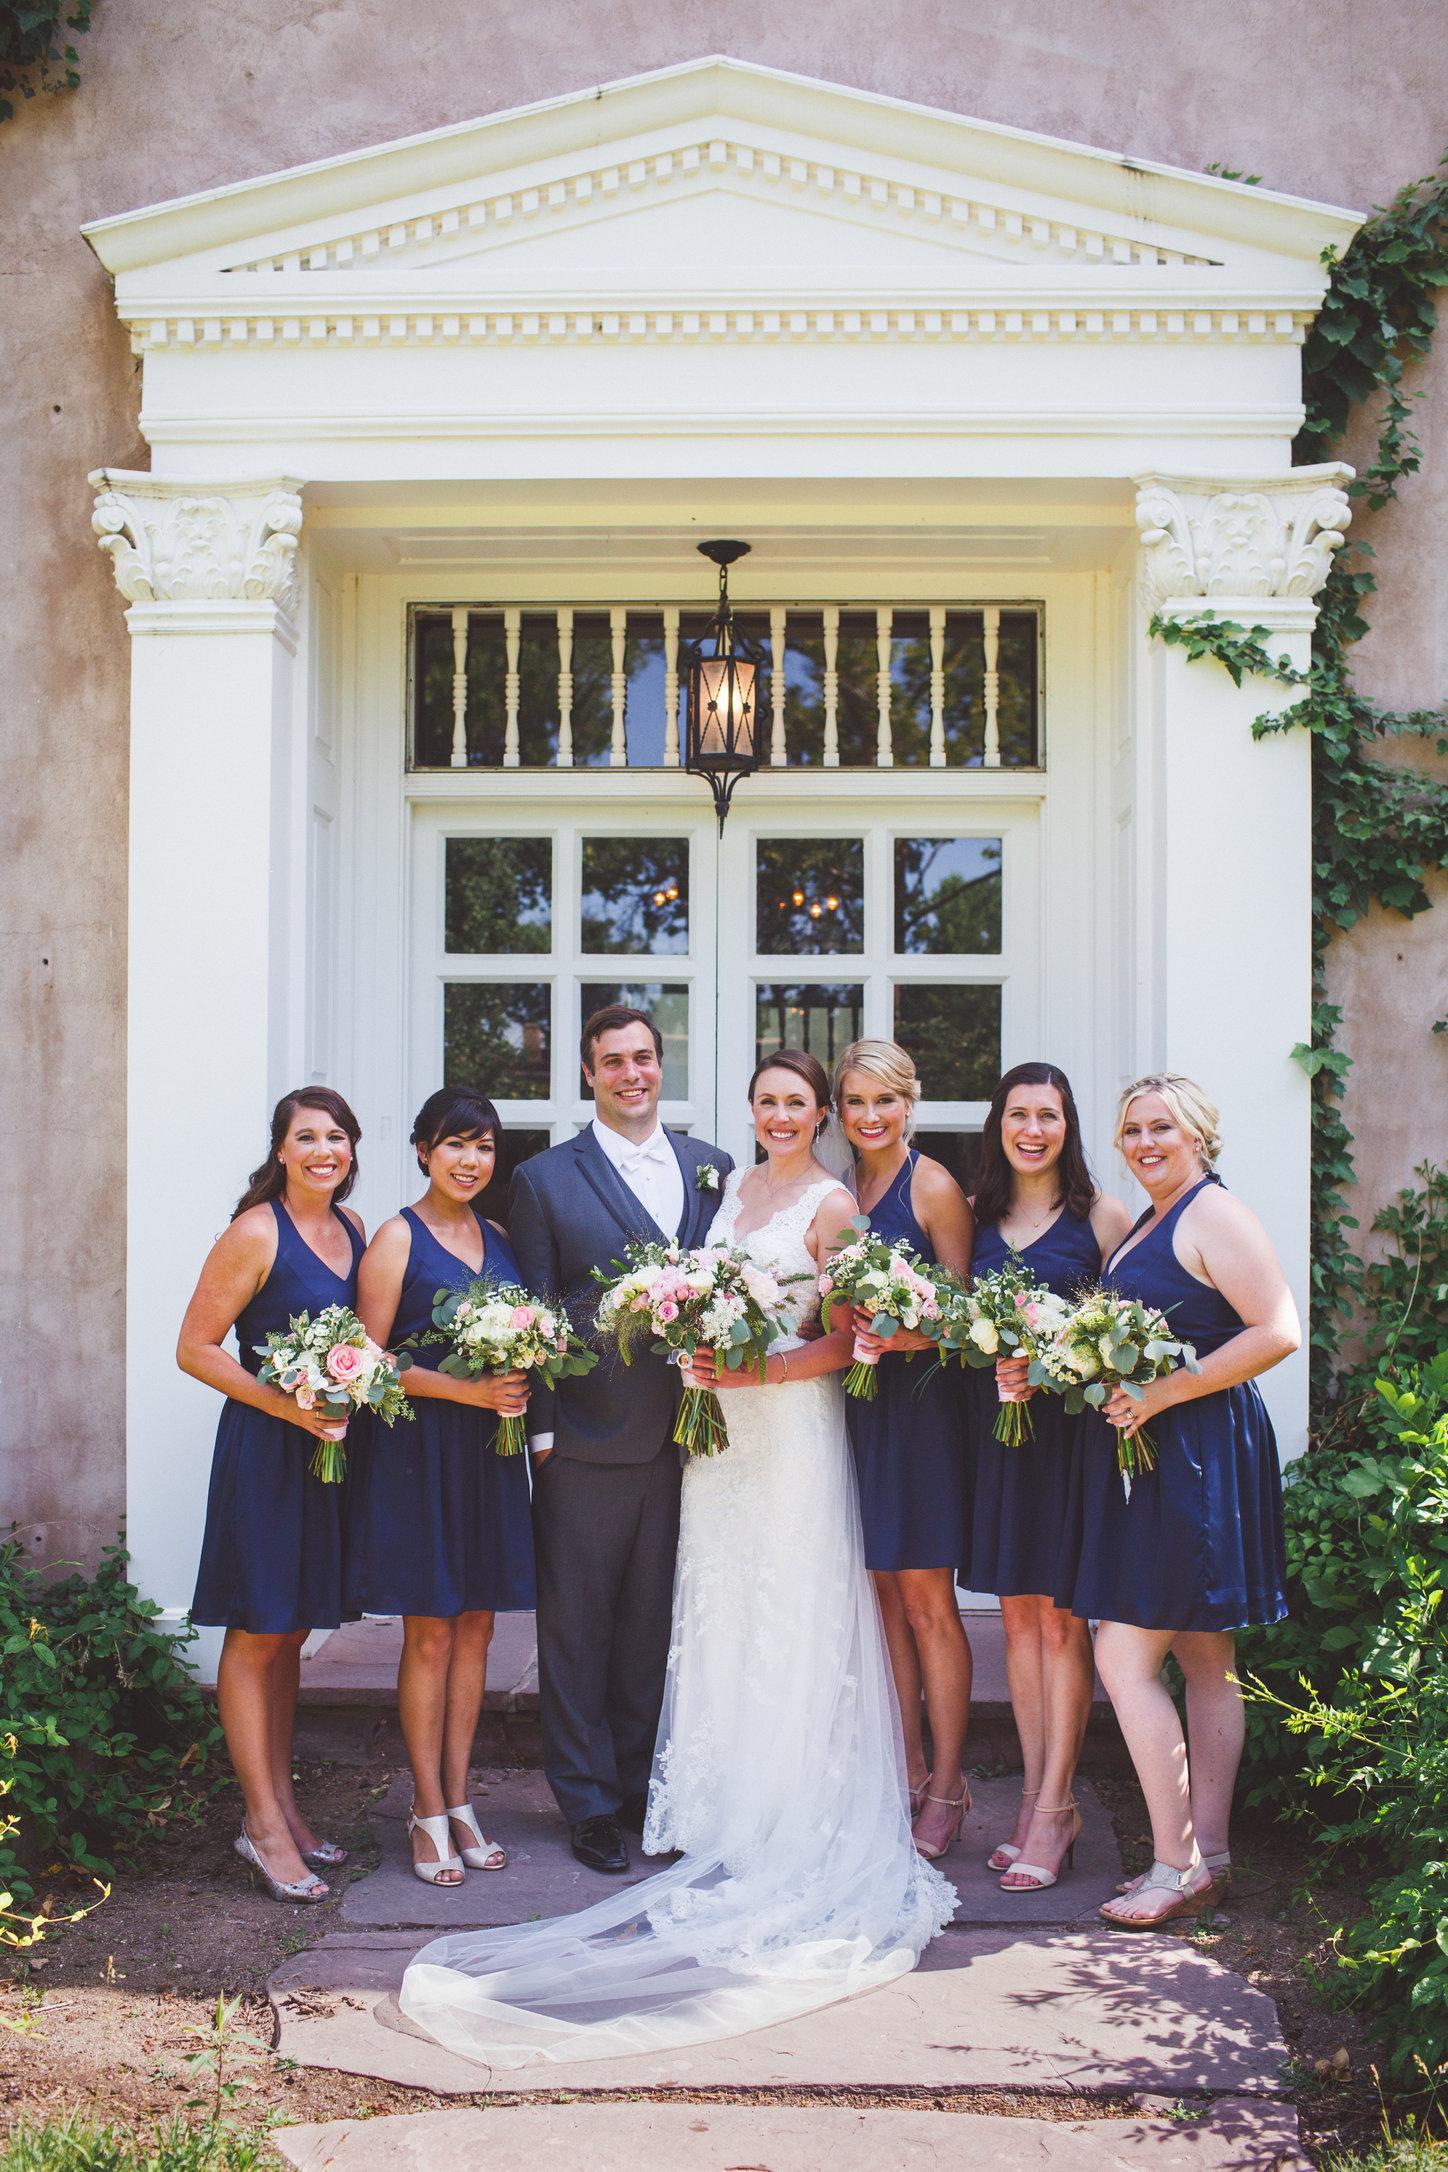 SandC-wedding-348.jpg